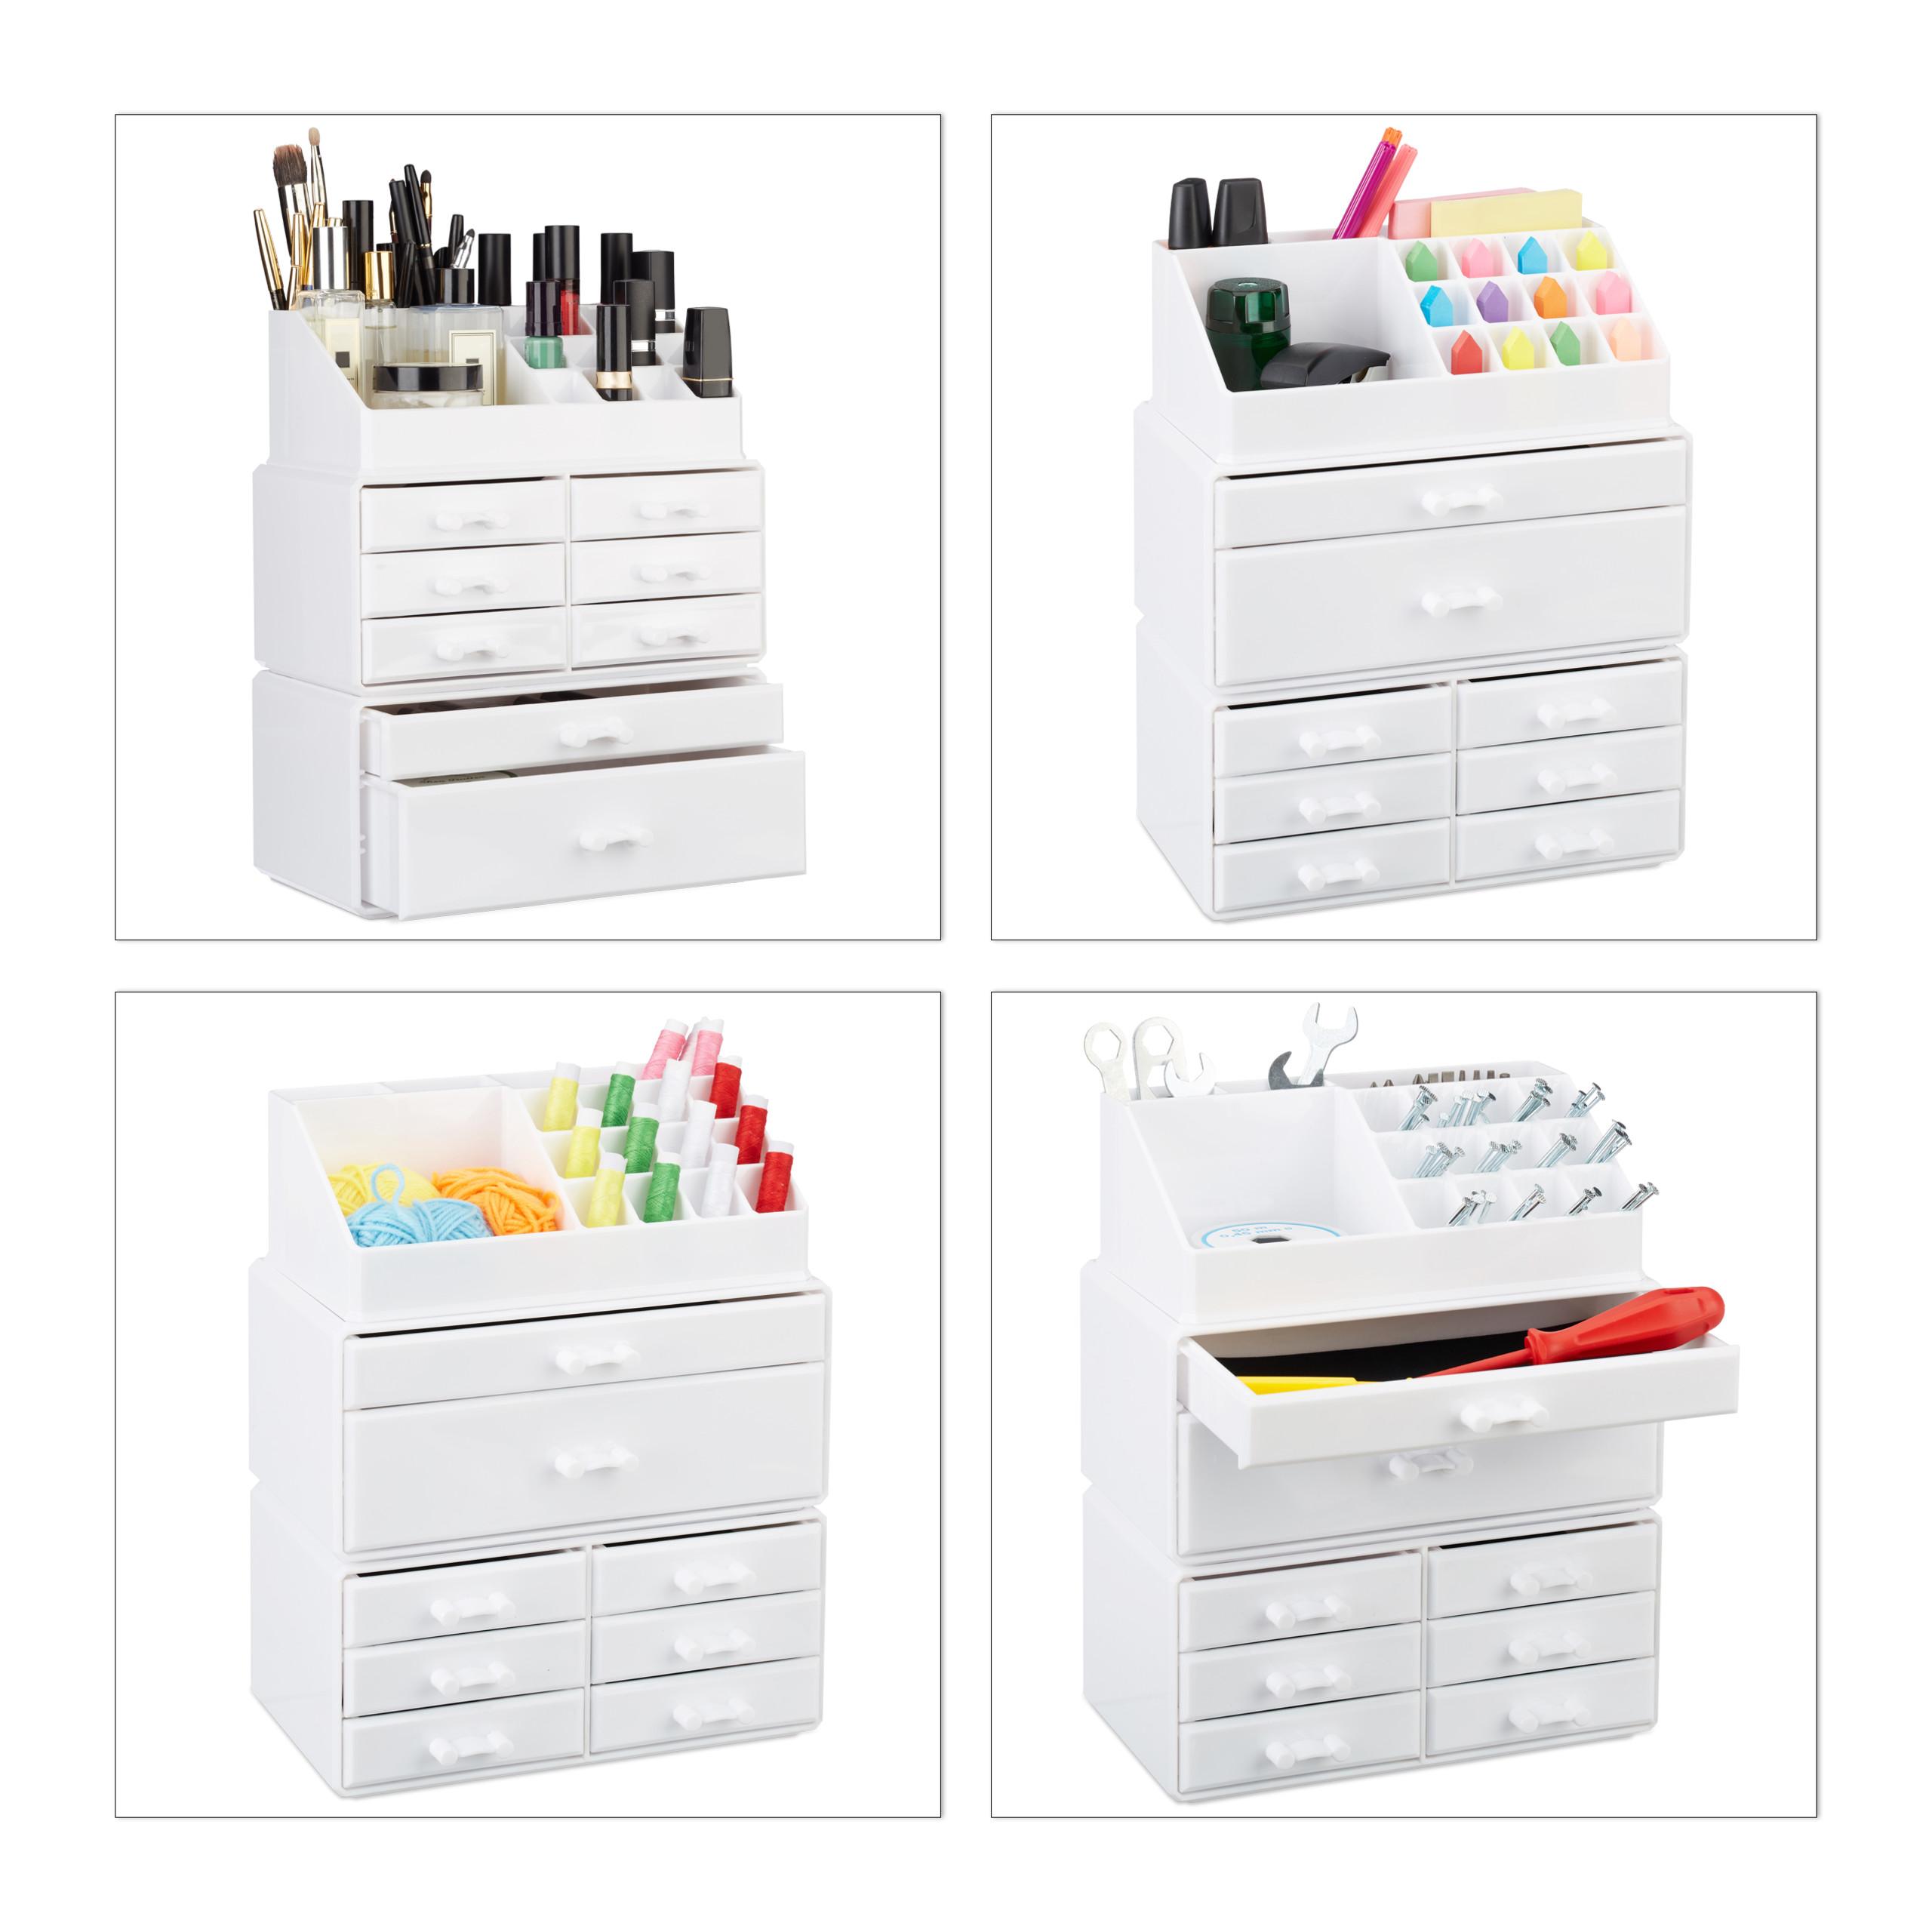 make-up-organizer-opbergen-van-cosmetica-acryl-stapelbaar-met-lades miniatuur 21